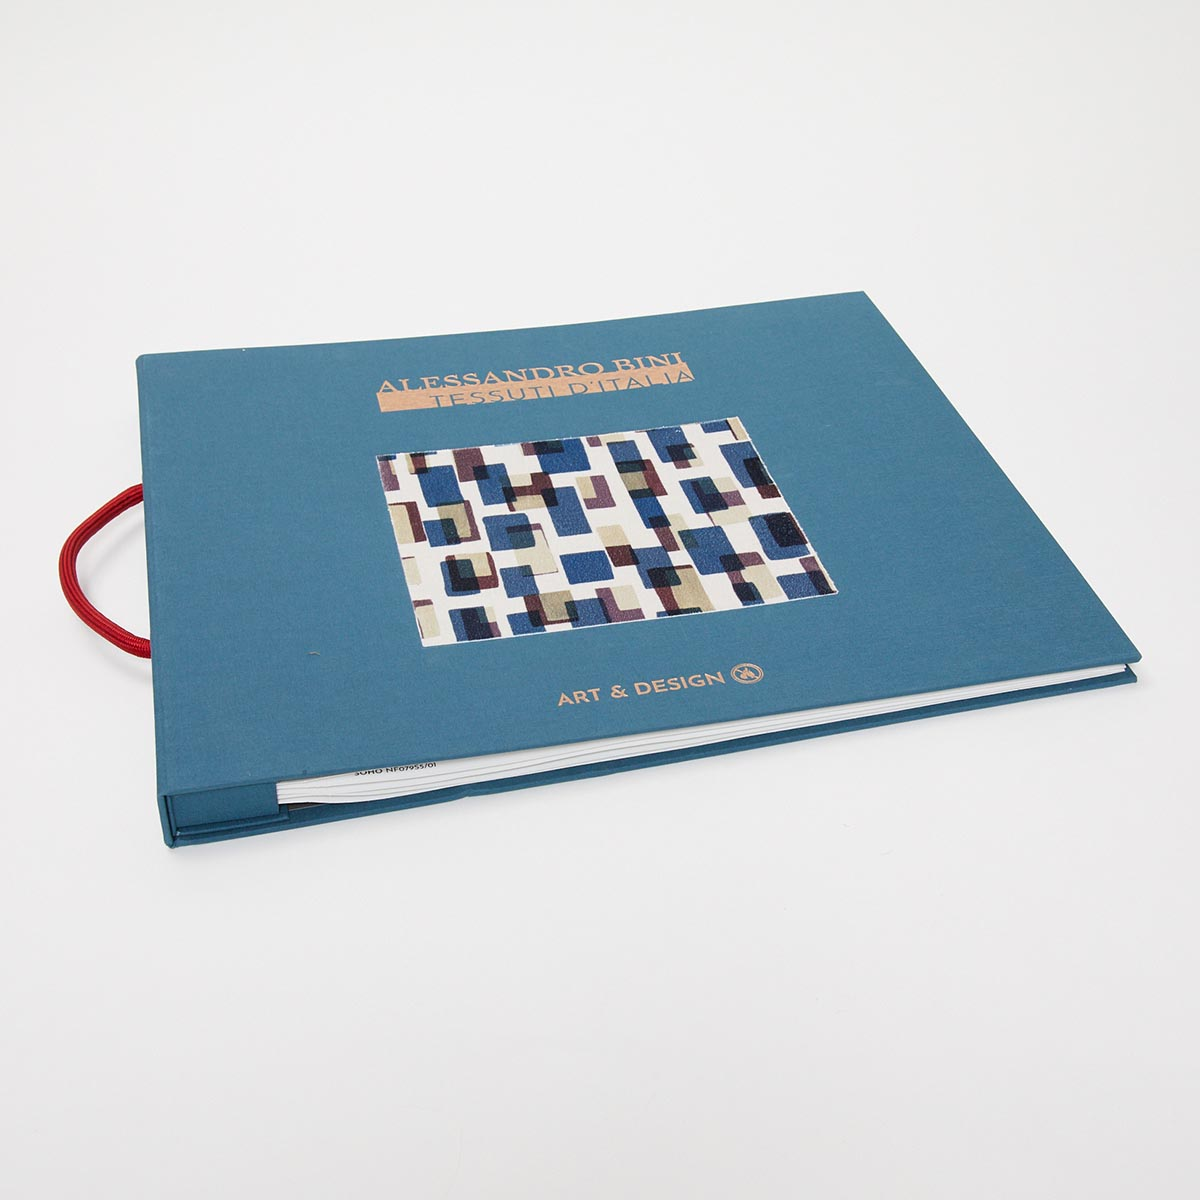 Sample Art & Design – Mazza